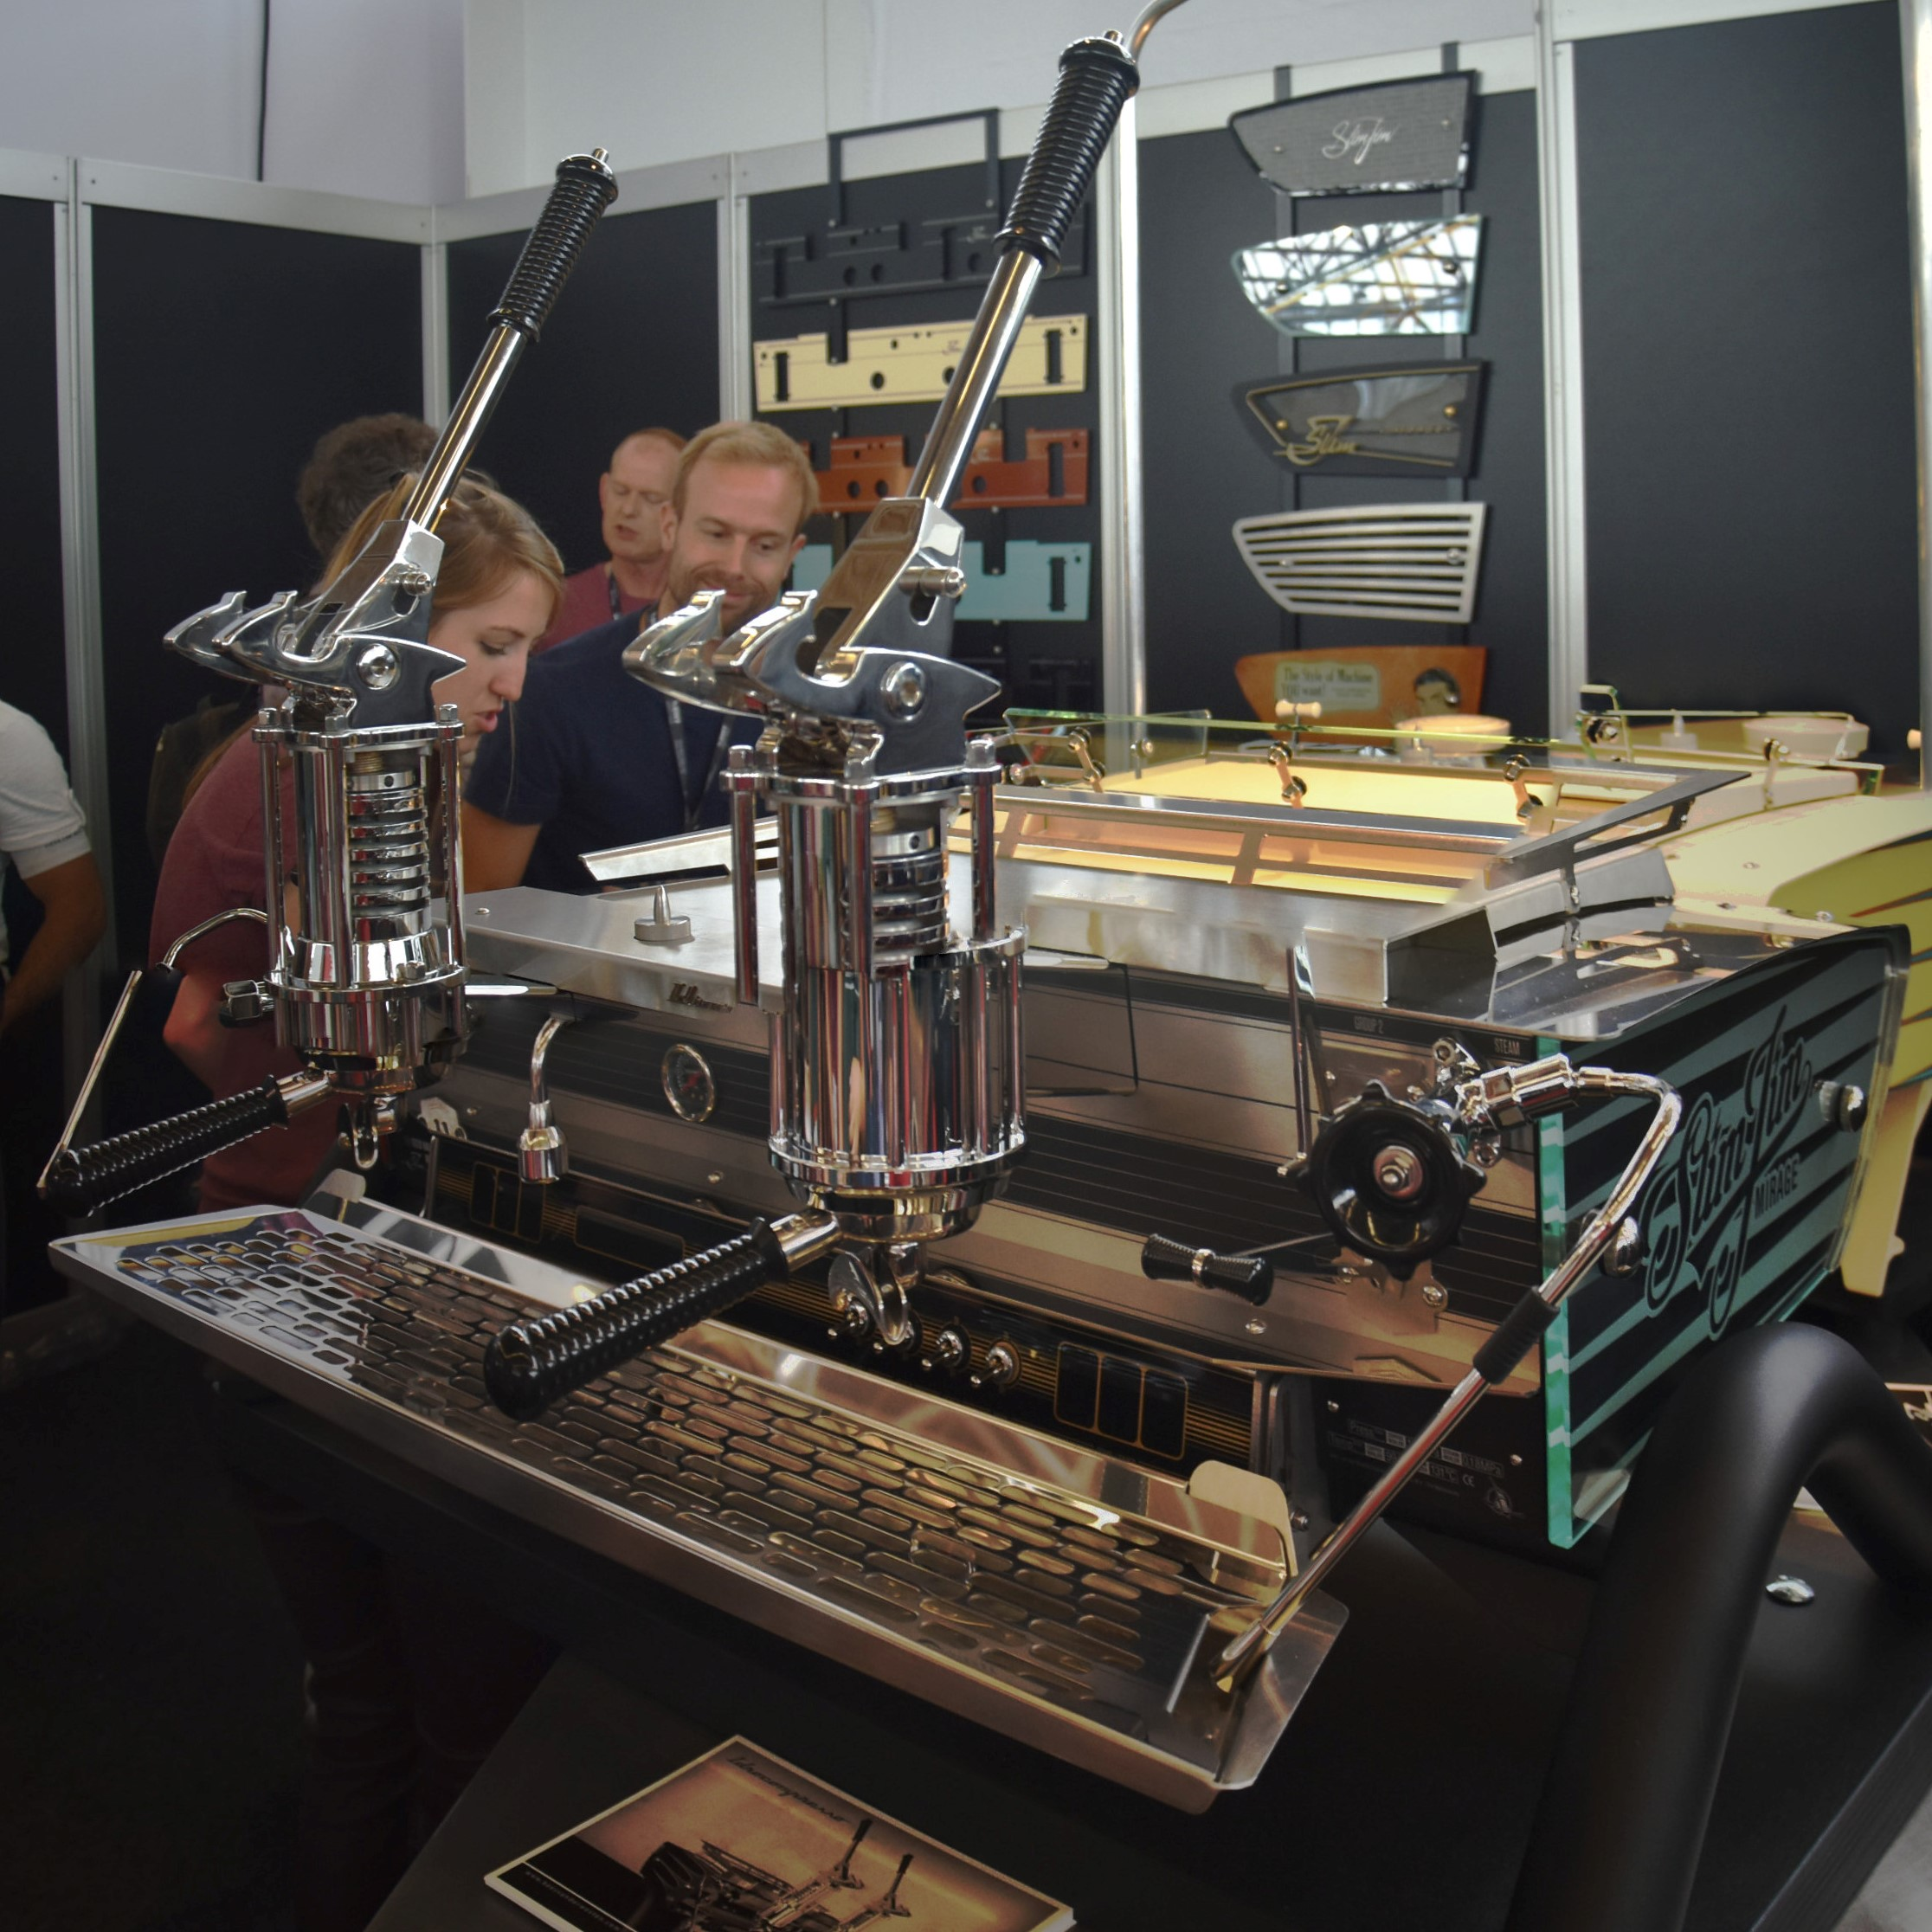 The new lever espresso machine from Kees van der Westen.